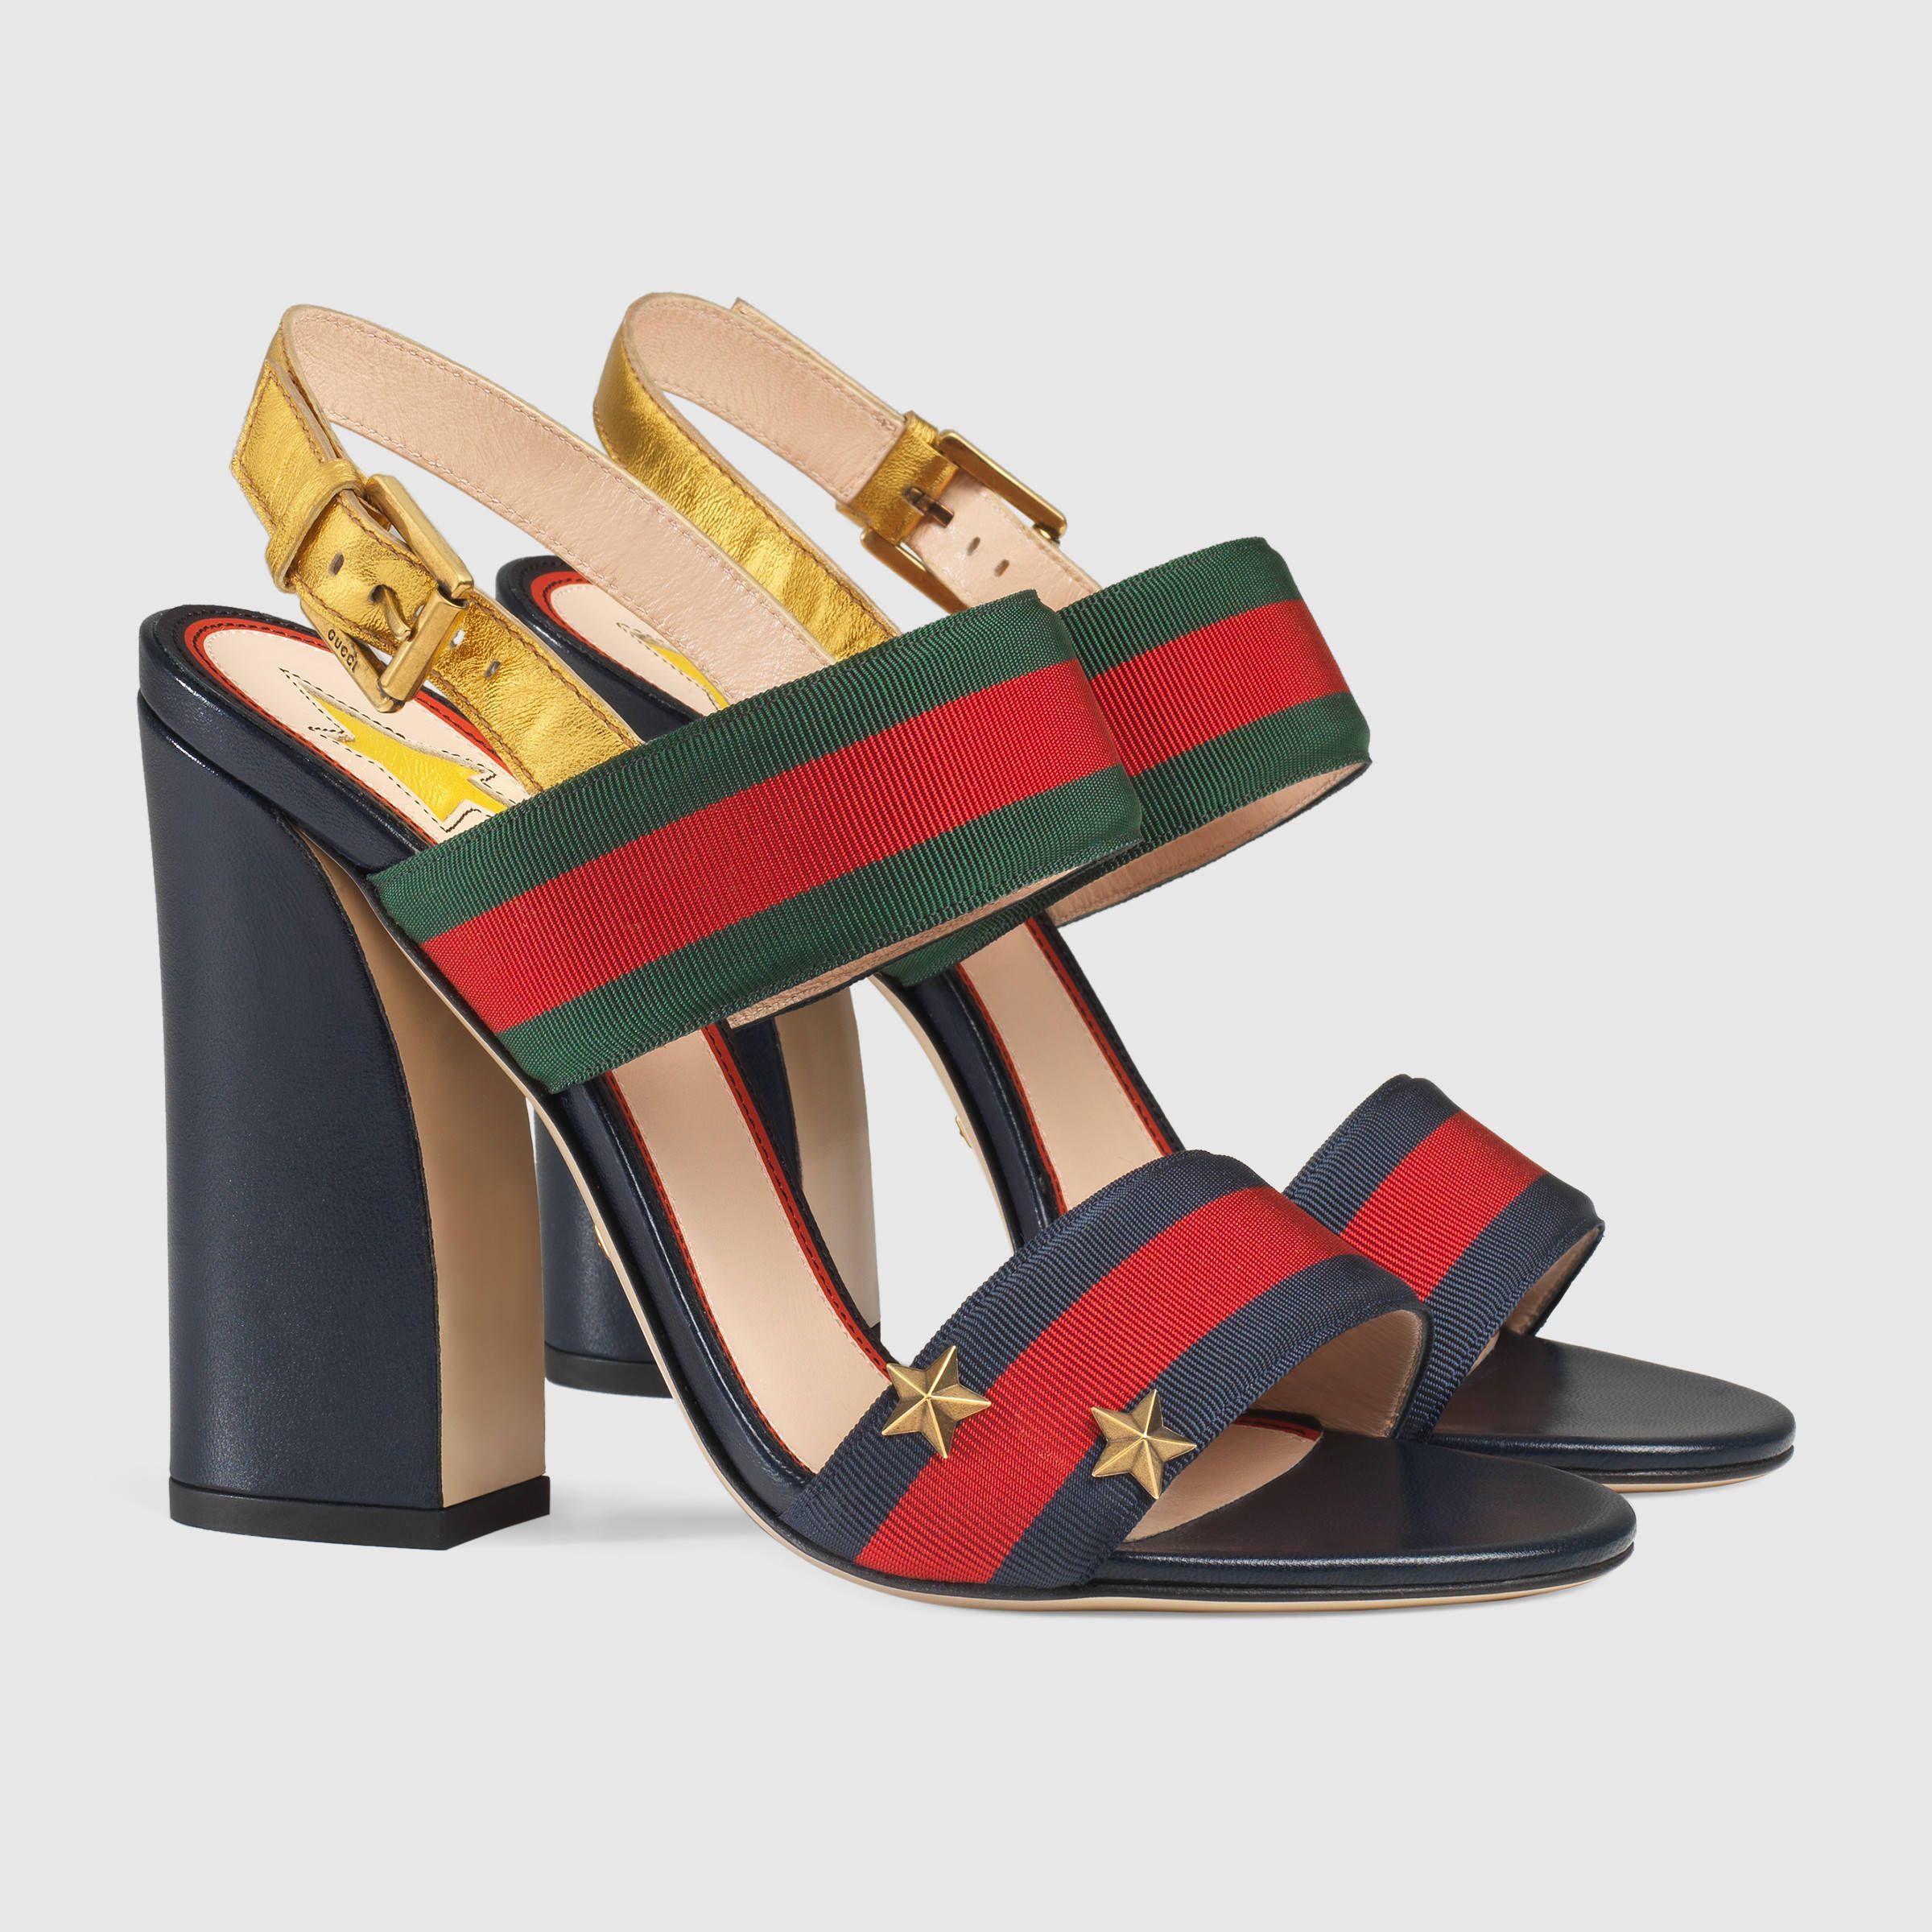 09ca3904813 Gucci Grosgrain Web sandal Detail 2  750